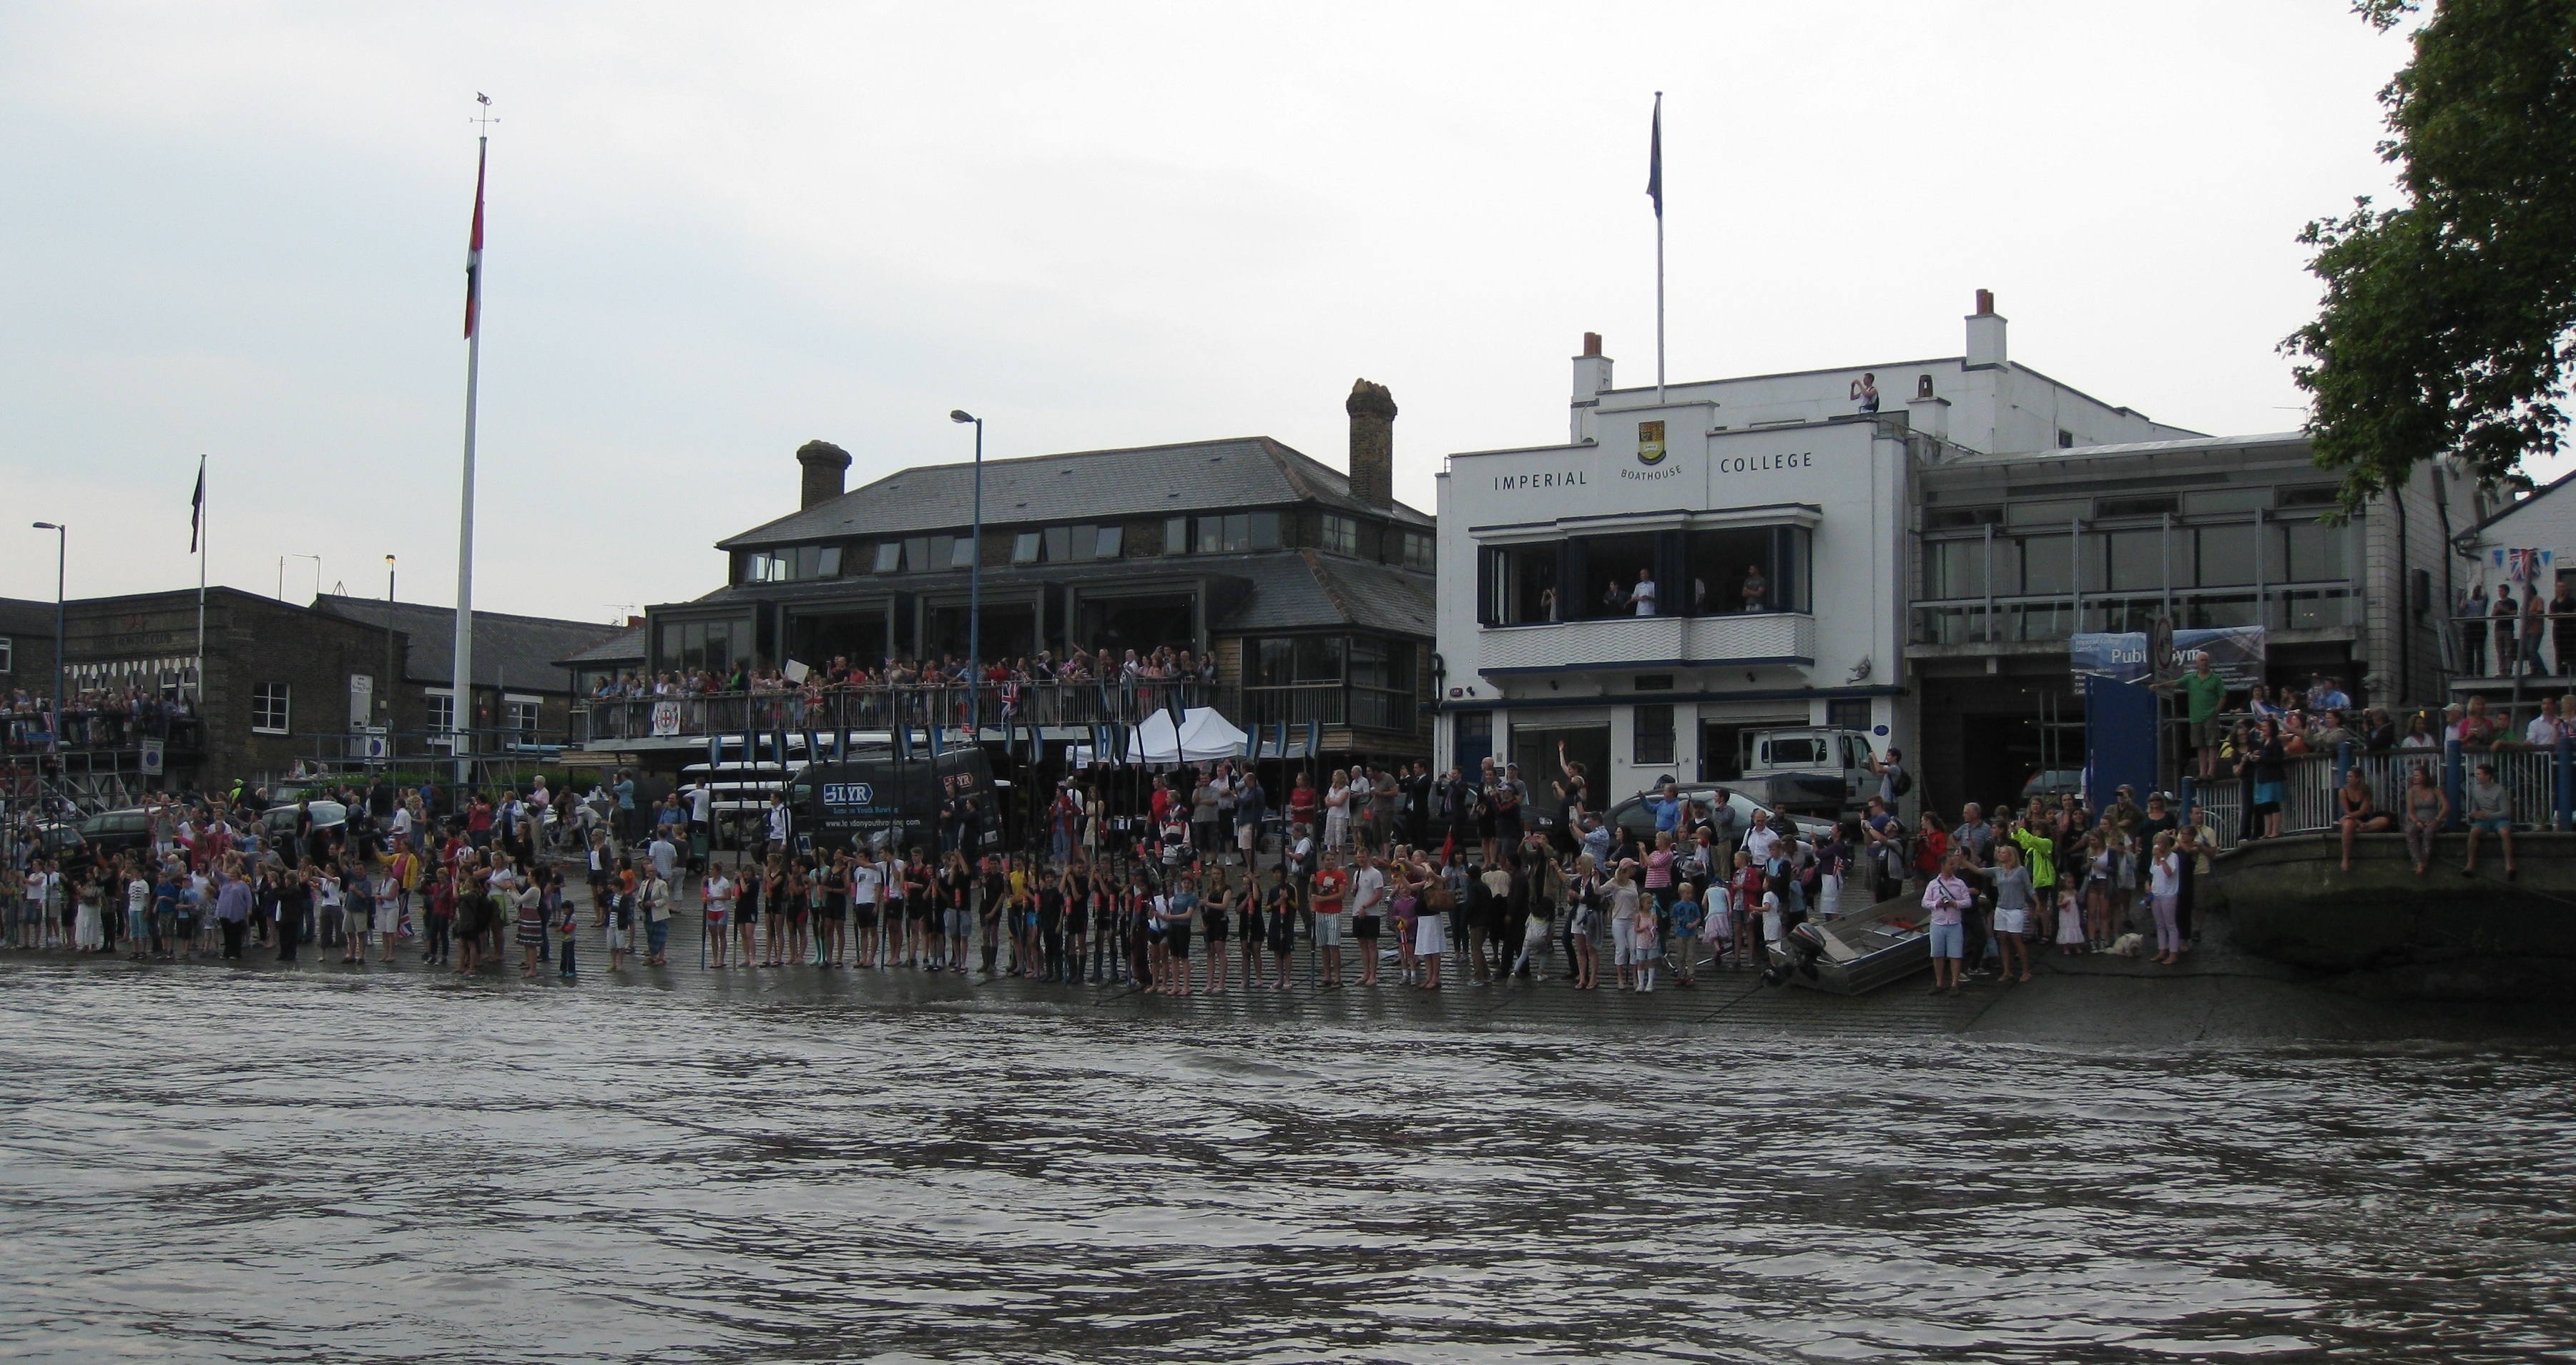 The Putney Embankment crowds